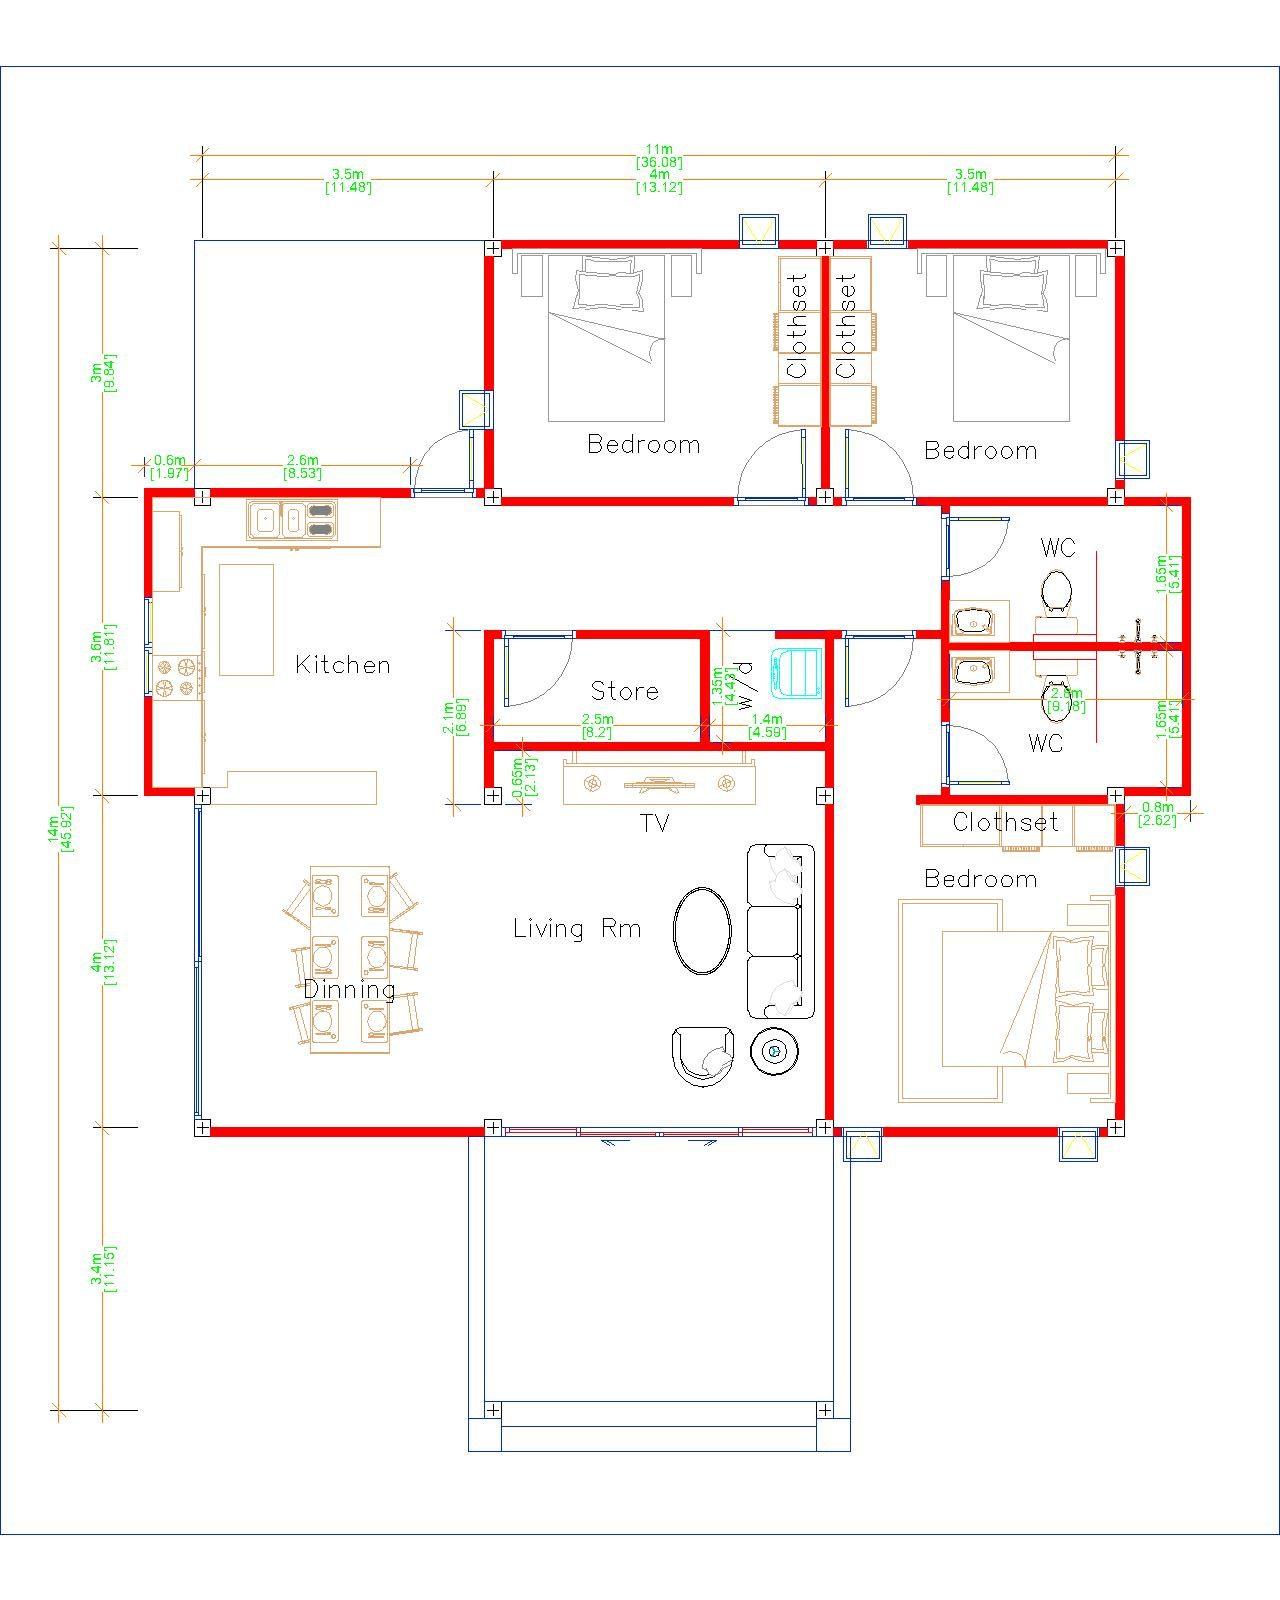 Cool Home Plans 11x14 Meters 36x46 Feet 3 Beds Layout floor plan